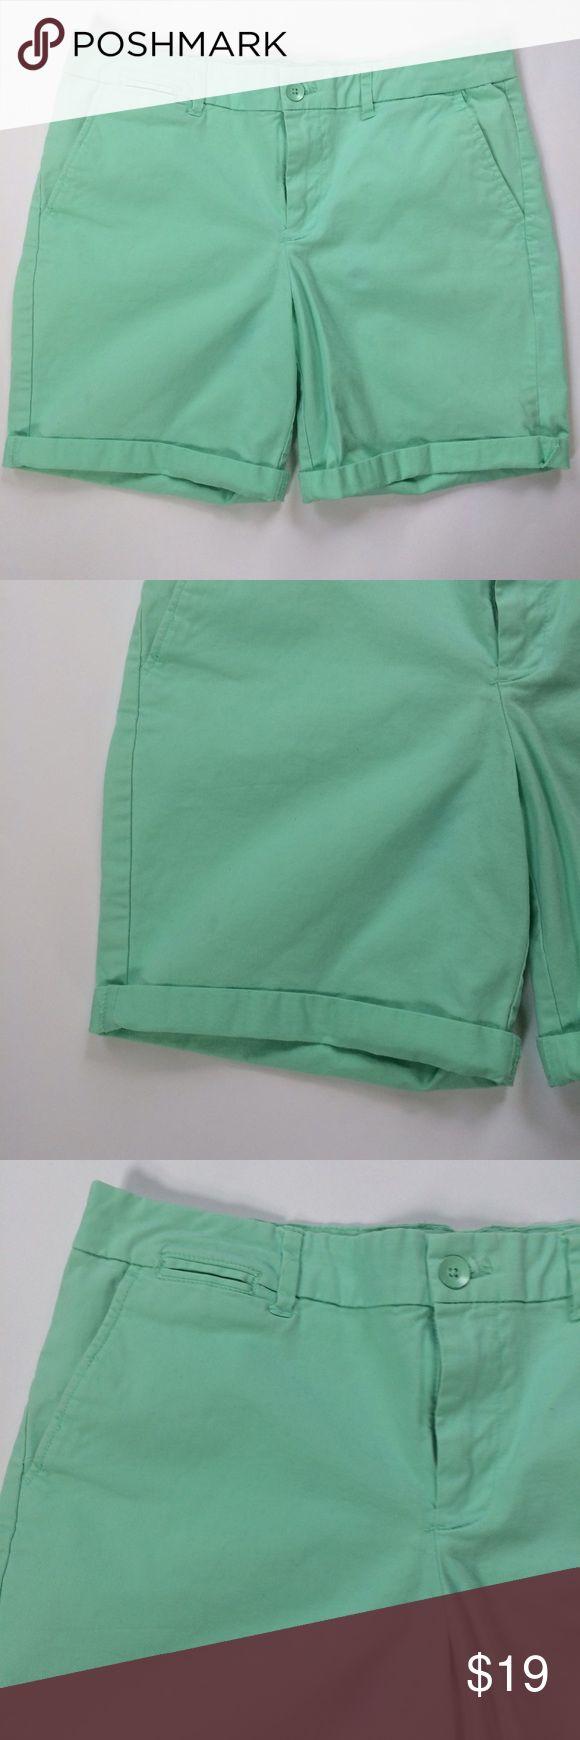 GAP mint green Boyfriend roll up khaki Shorts Cotton roll up Boyfriend shorts. Gently worn. Zipper and button closure. GAP Shorts